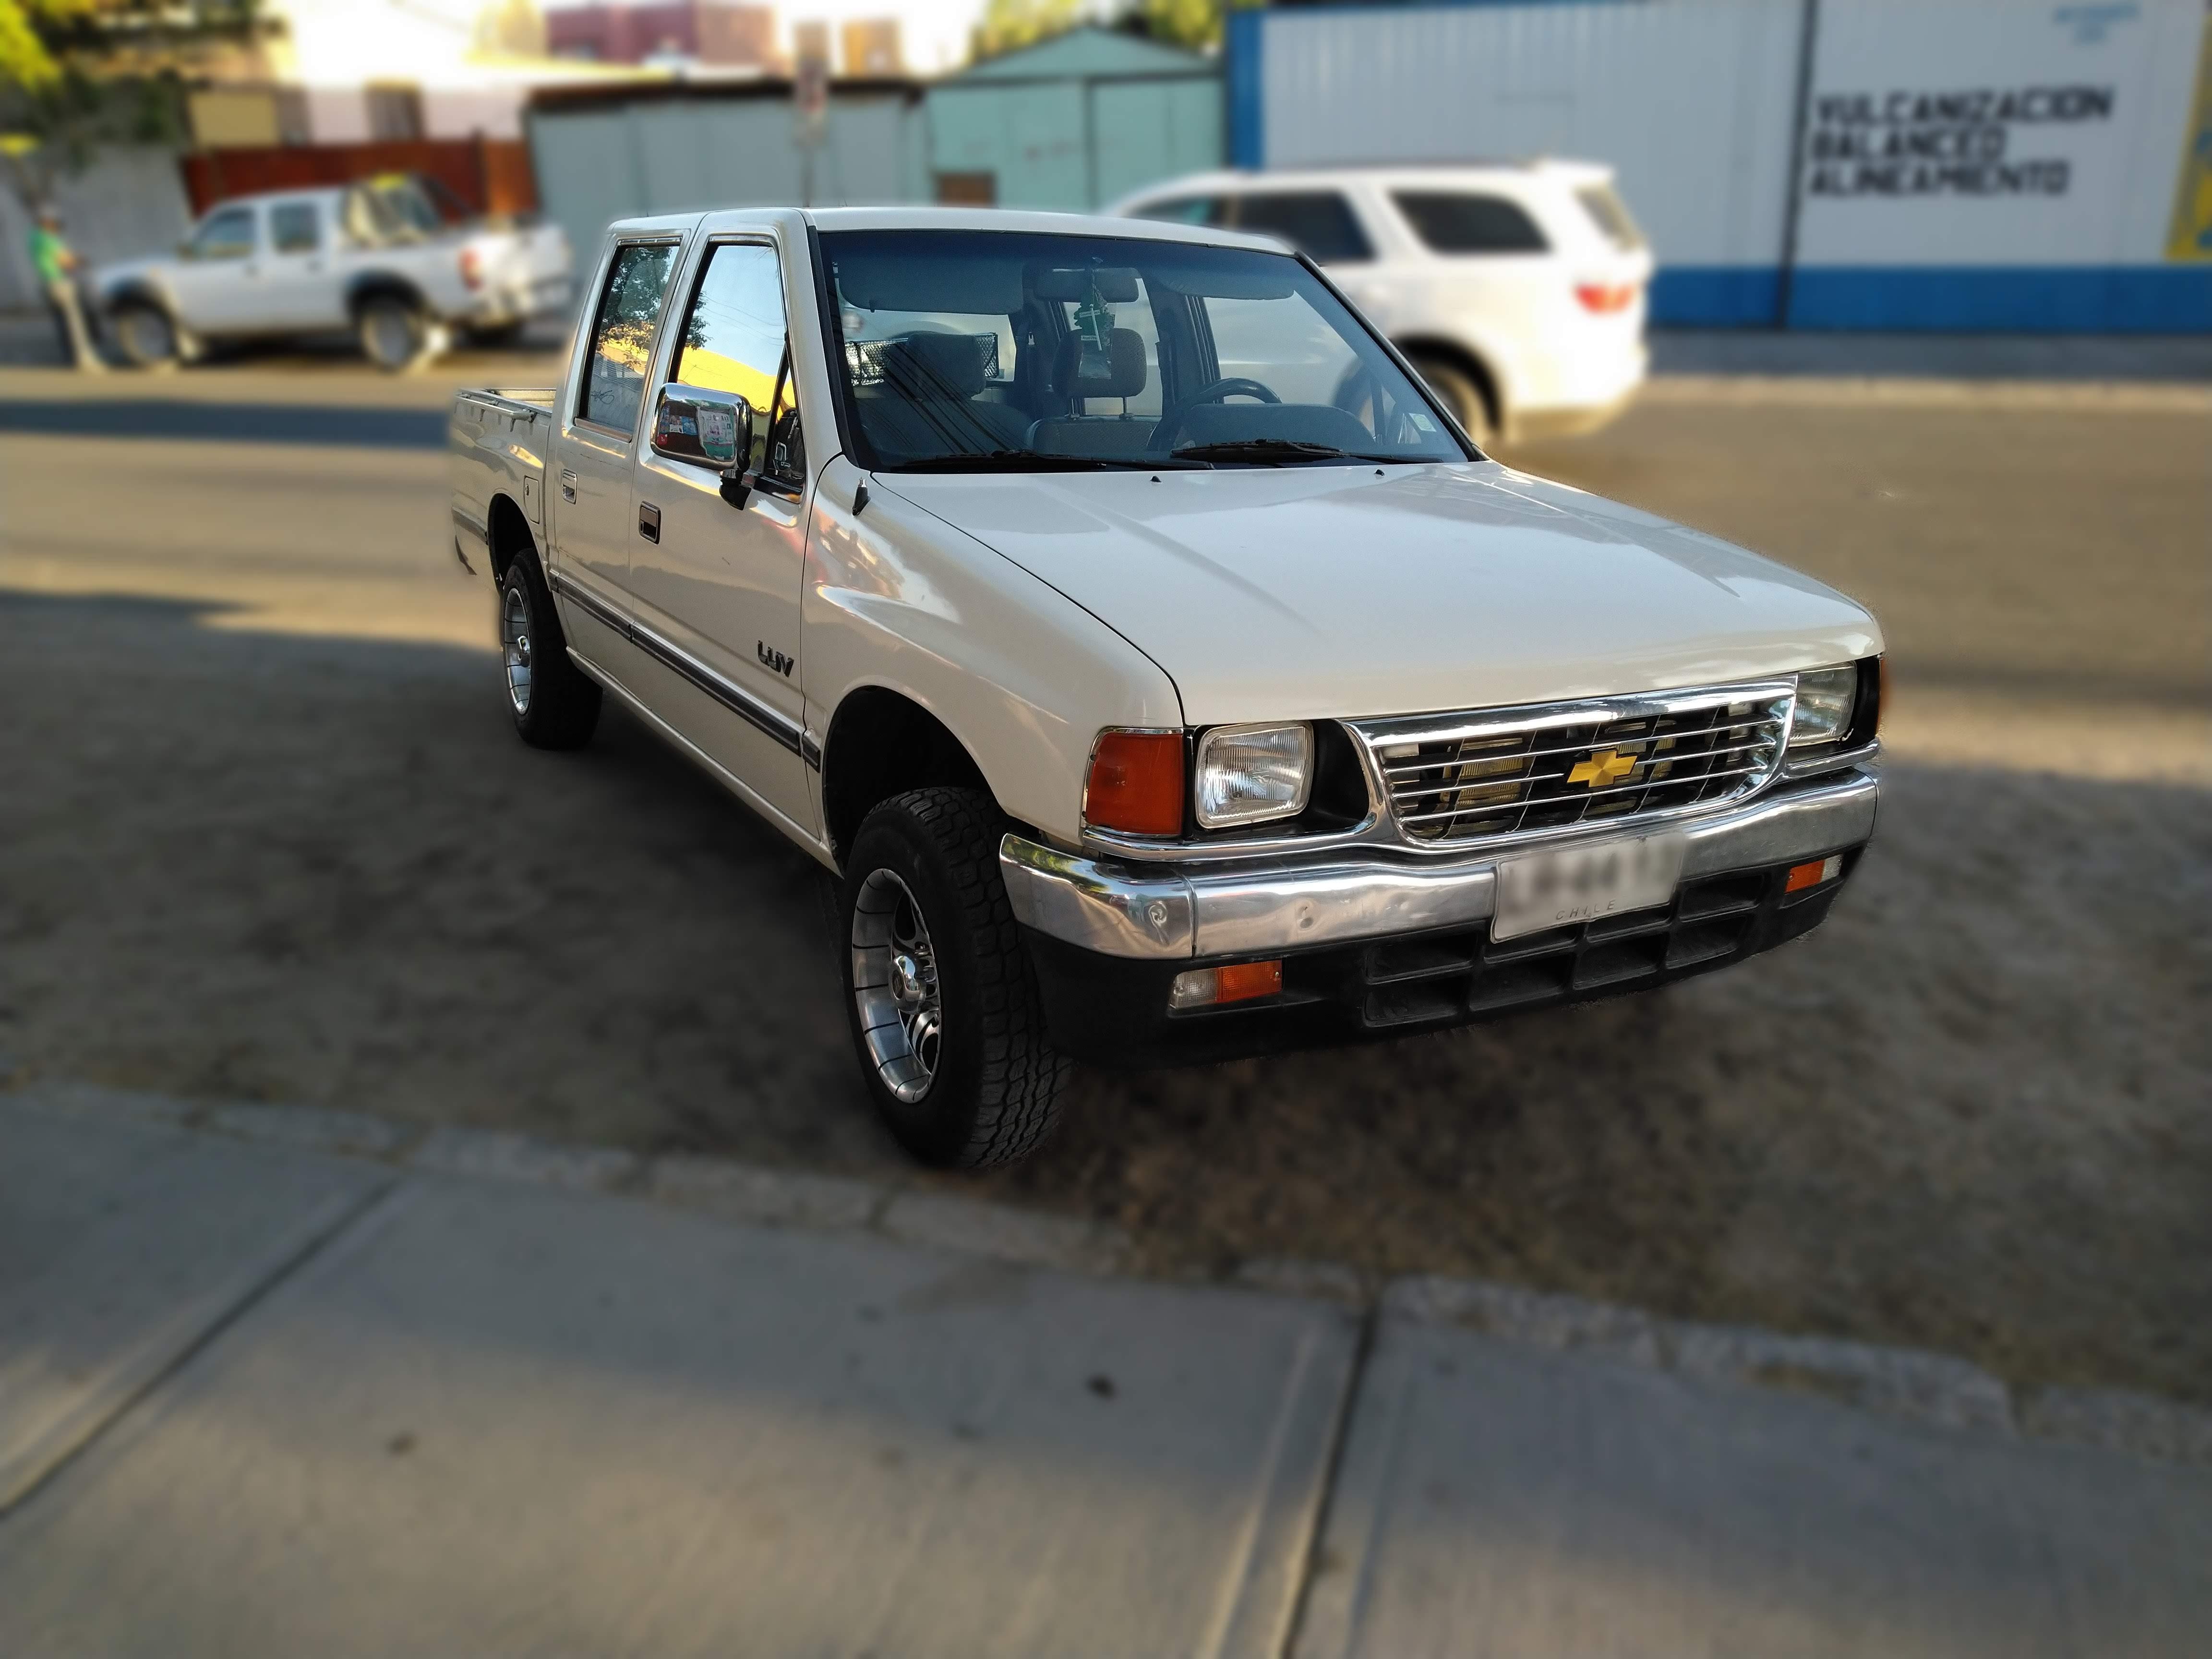 File:Chevrolet (isuzu) luv jpg - Wikimedia Commons